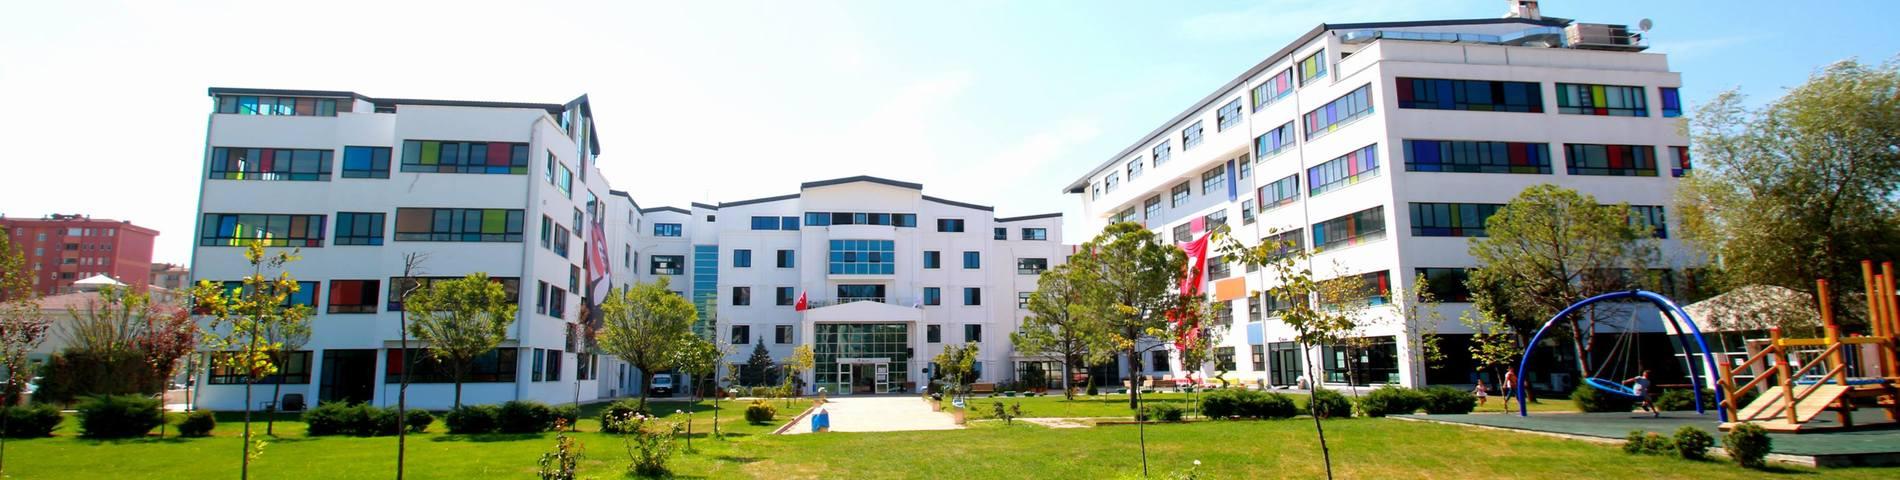 Natillus International Language Academy Junior Summer School зображення 1